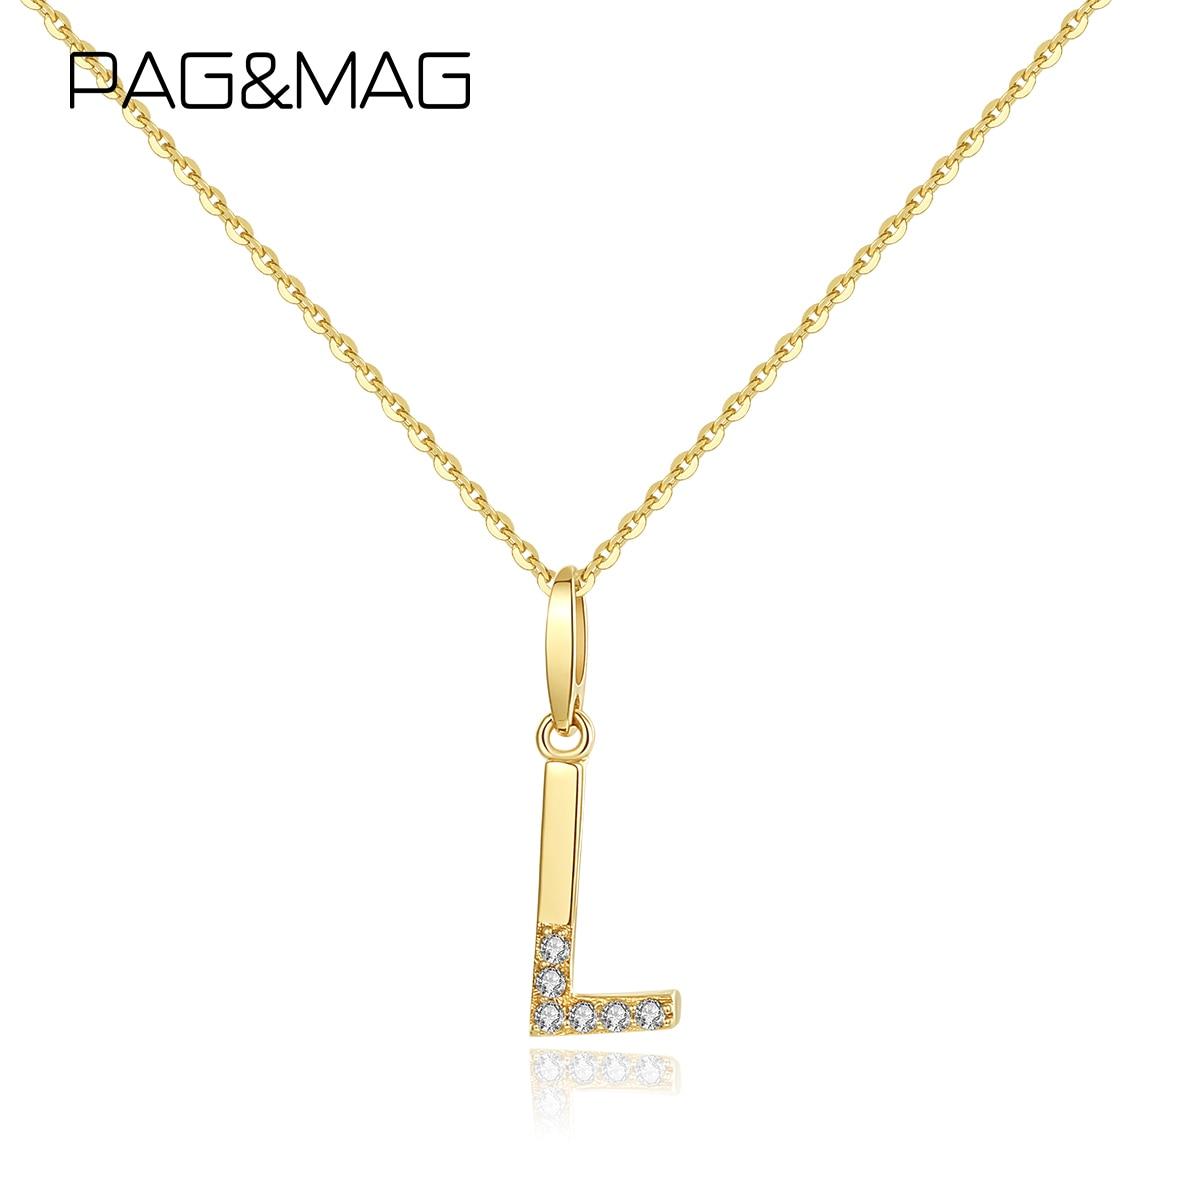 Pag & mag genuíno 14k ouro sólido letras iniciais pingente colar para mulher ouro amarelo 585 colar de jóias finas presente n14120